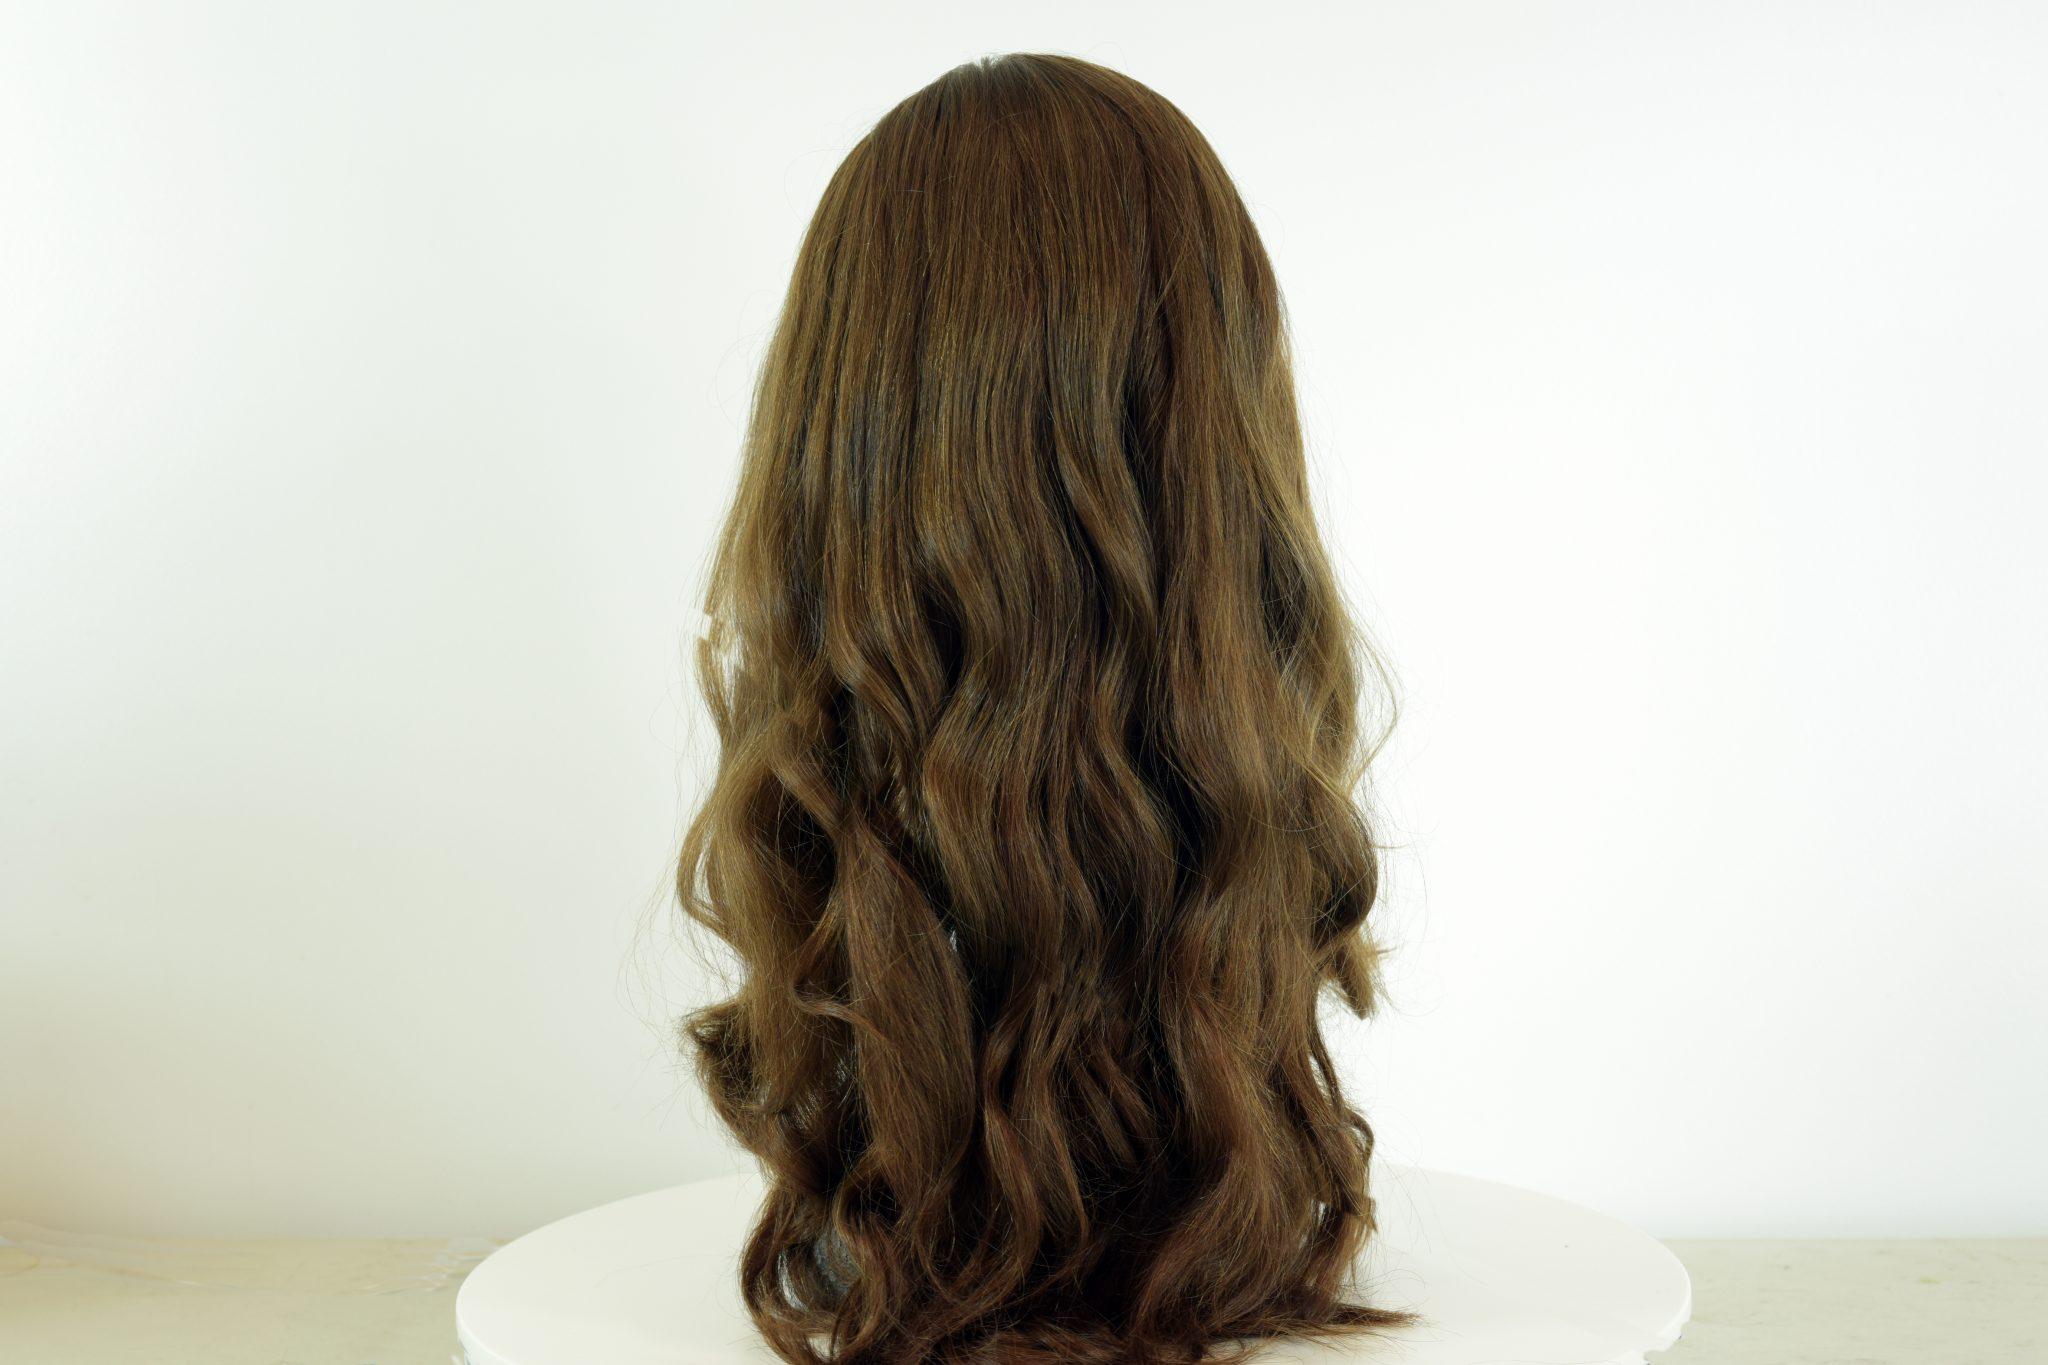 gallery-hair Naama Group academy awards event 2016,Naama group, Naama wigs, Naama hair, 360 degree band, I band, wigless wig, virgin rely hir, processed hair, custom wigs, Frum Wigs, Sheitels, kosher wigs